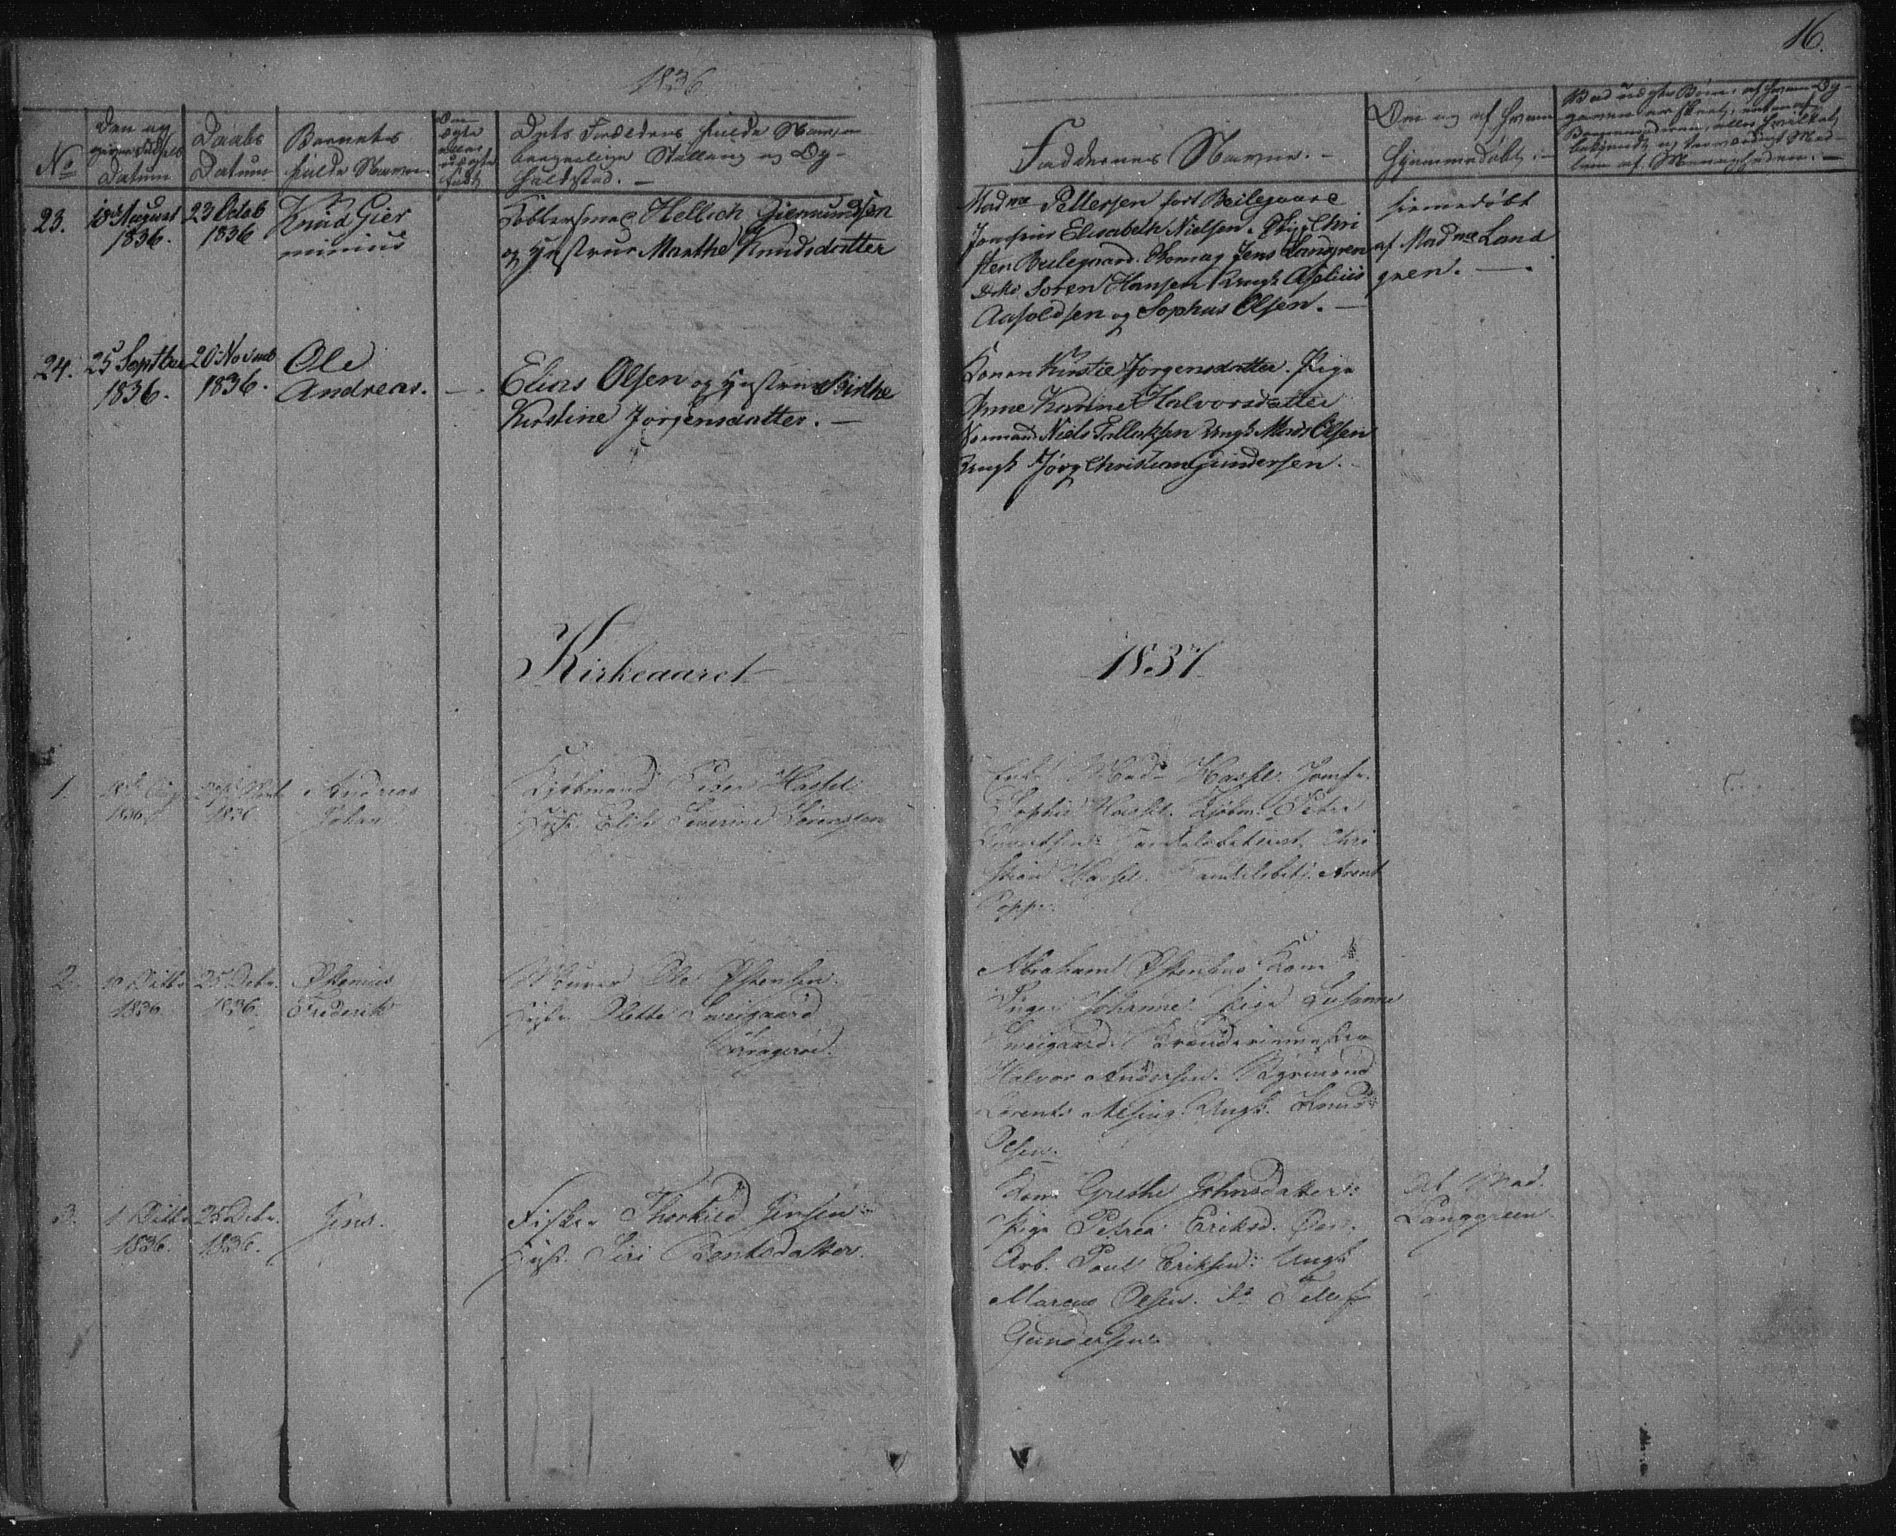 SAKO, Kragerø kirkebøker, F/Fa/L0005: Ministerialbok nr. 5, 1832-1847, s. 16